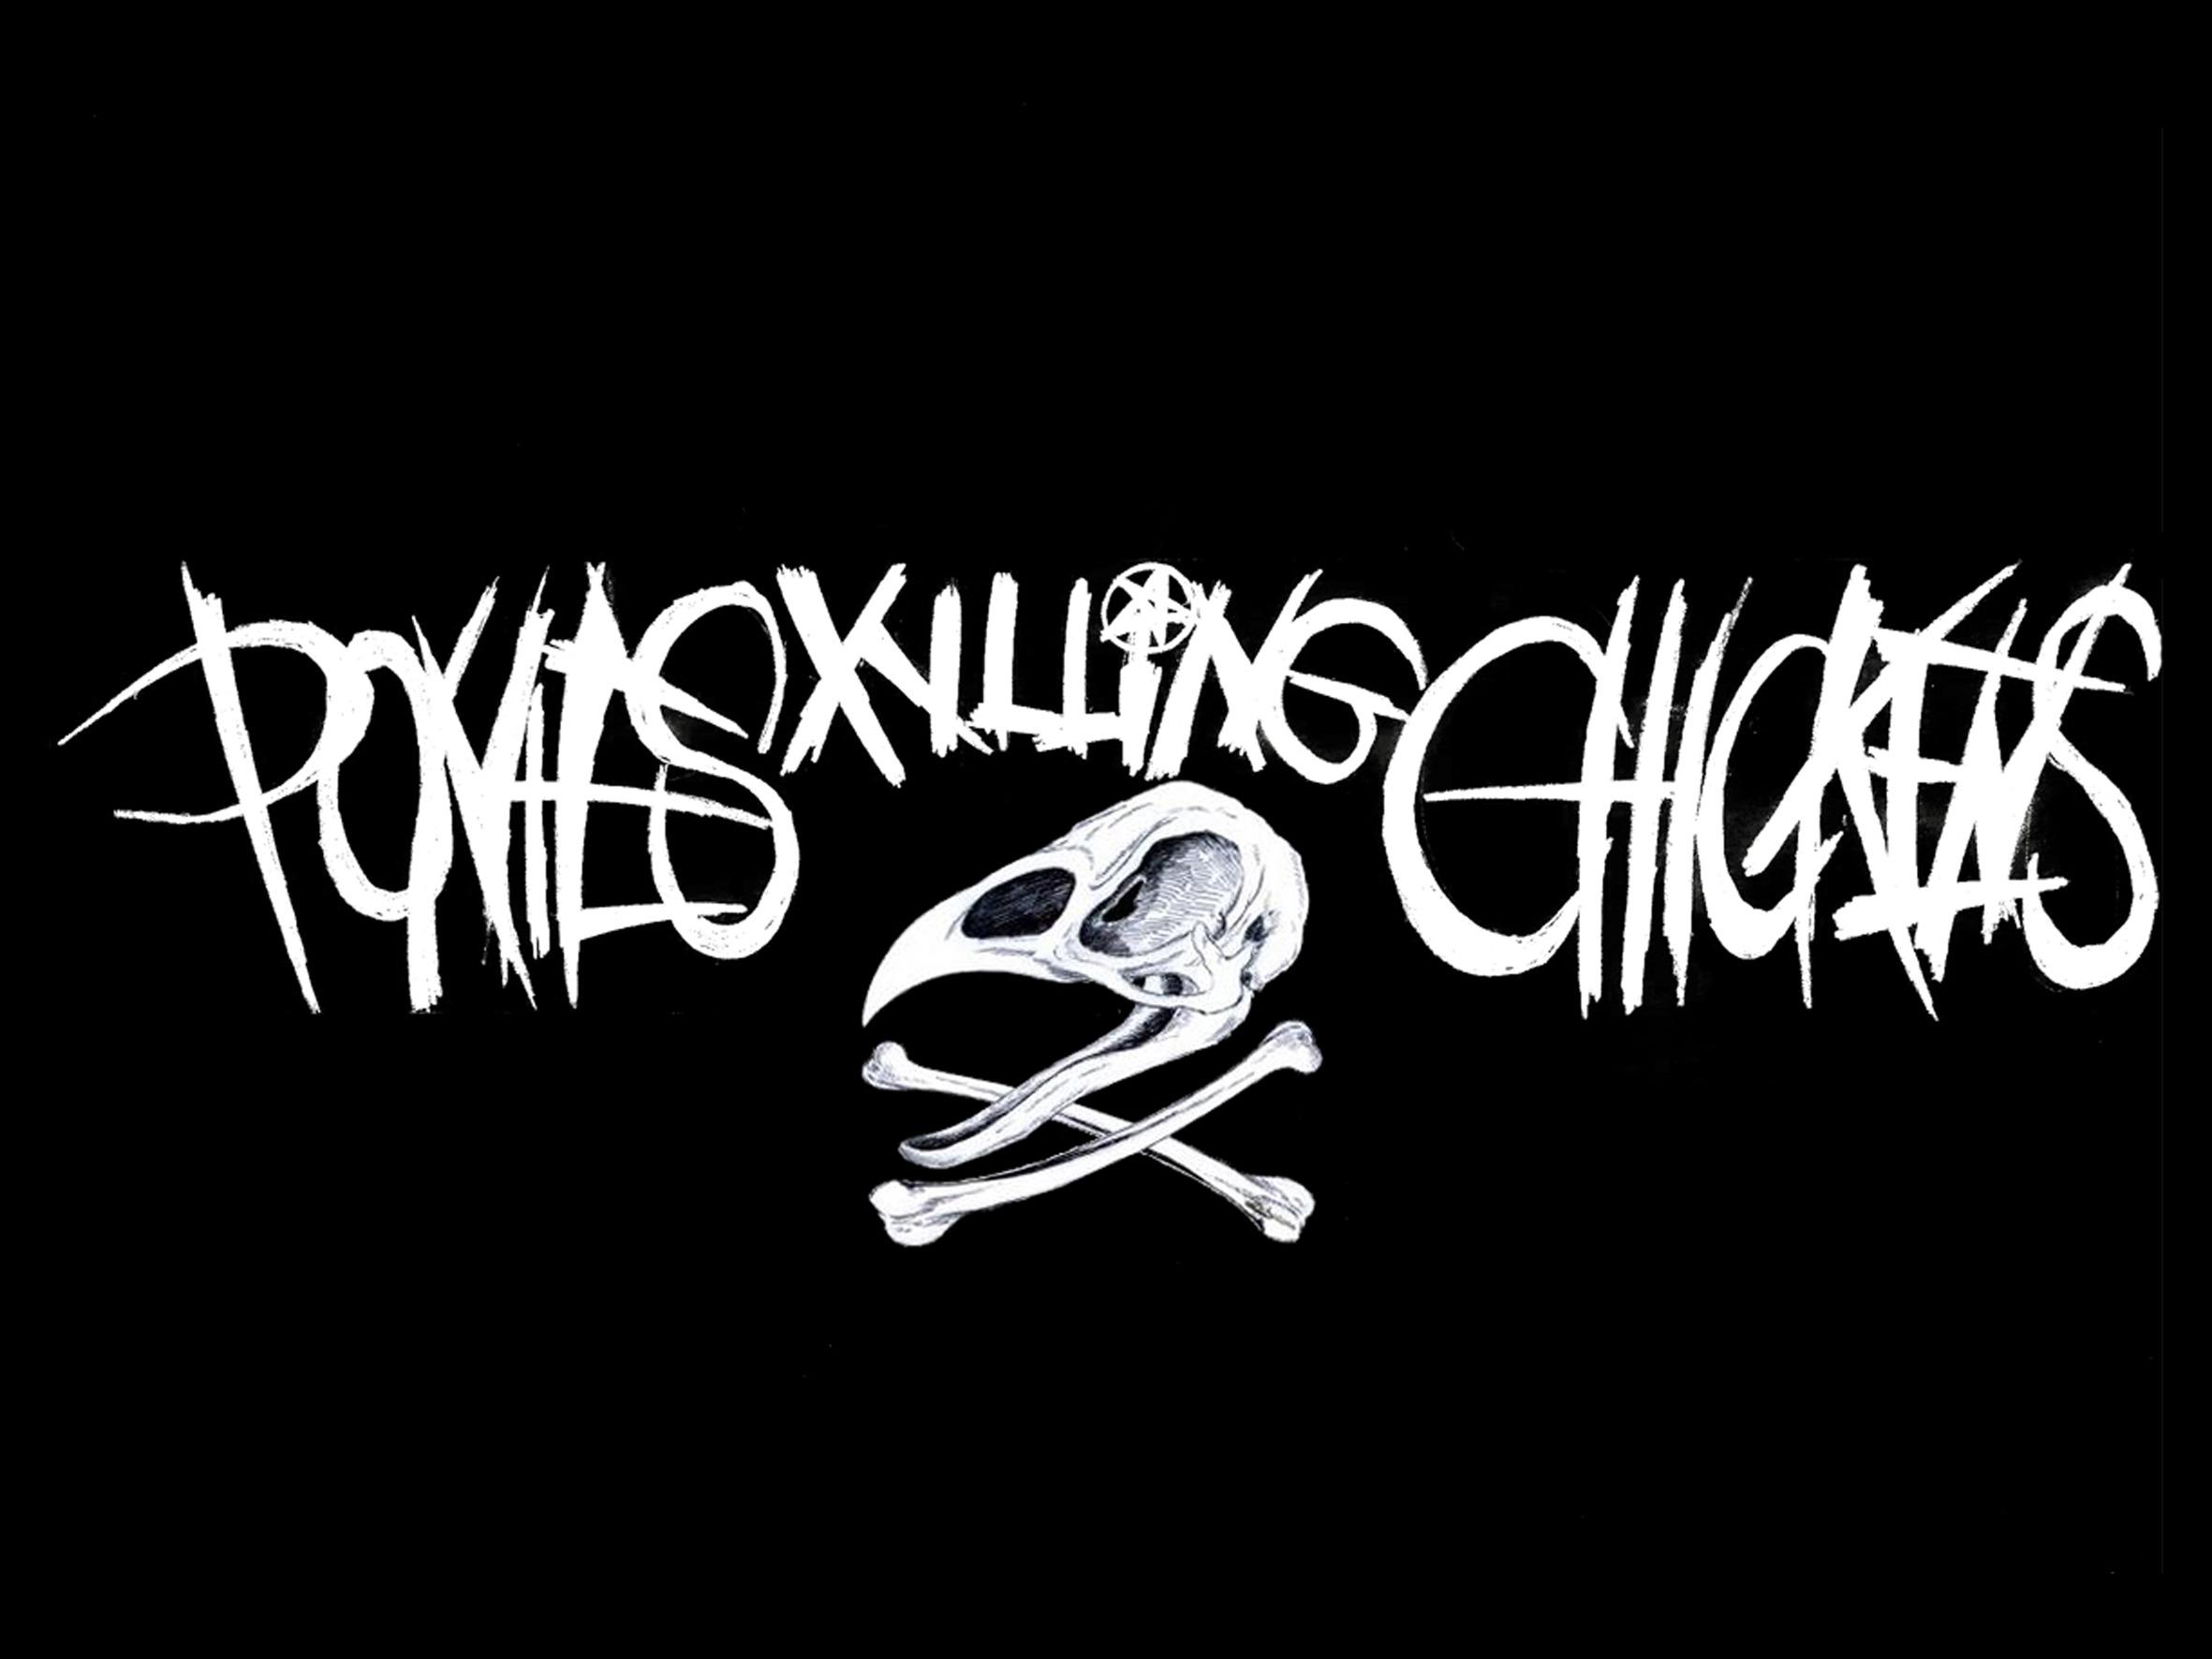 SYMMETRIC CHAOS – INVERSUS – PONIES KILLING CHICKENS